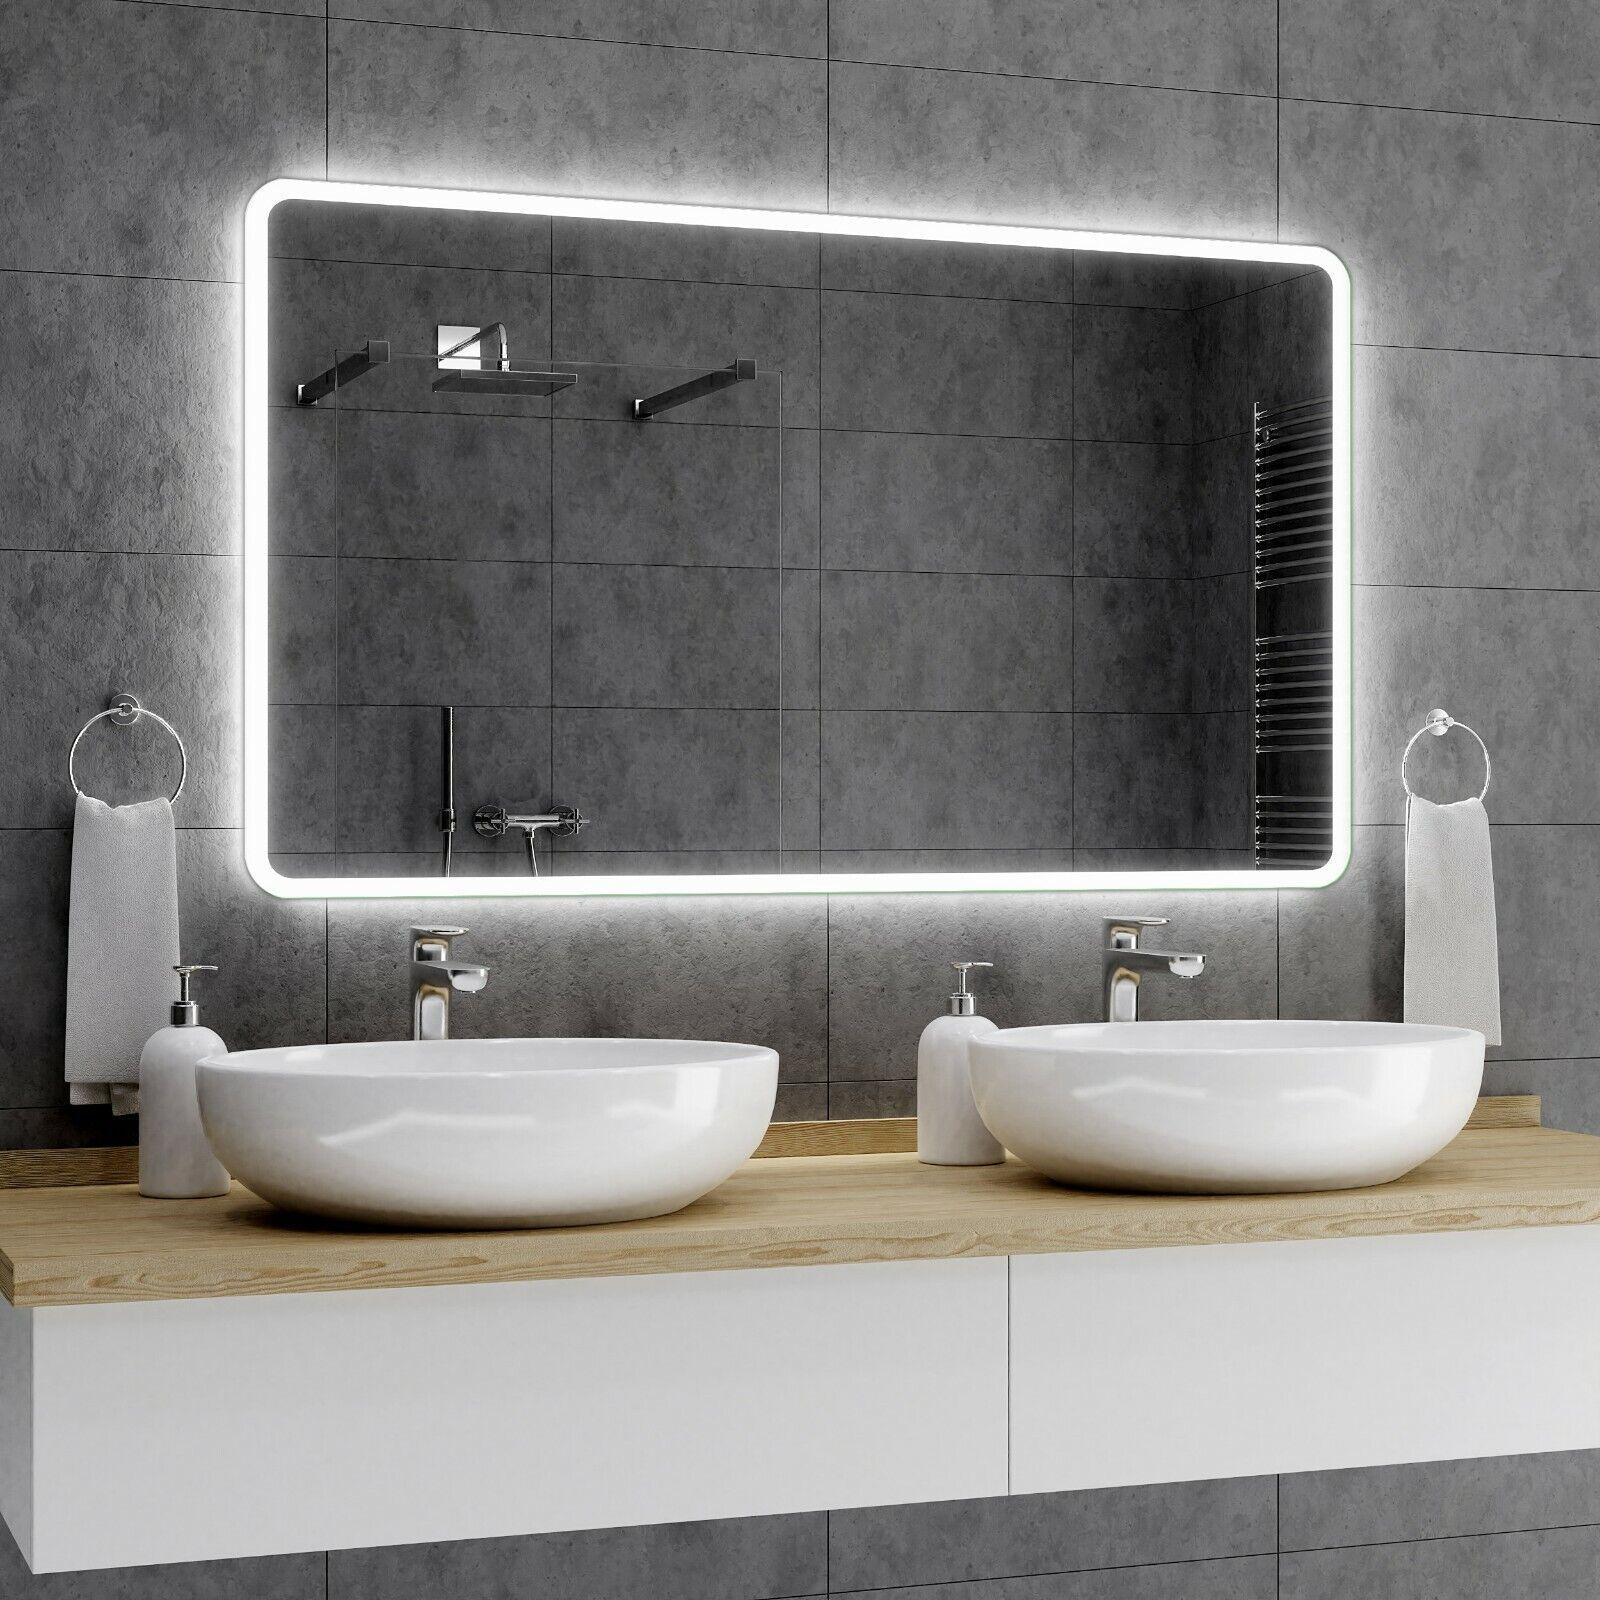 OSAKA Badezimmerspiegel Led Badspiegel Lichtspiegel Wandspiegel spiegel Maß A01